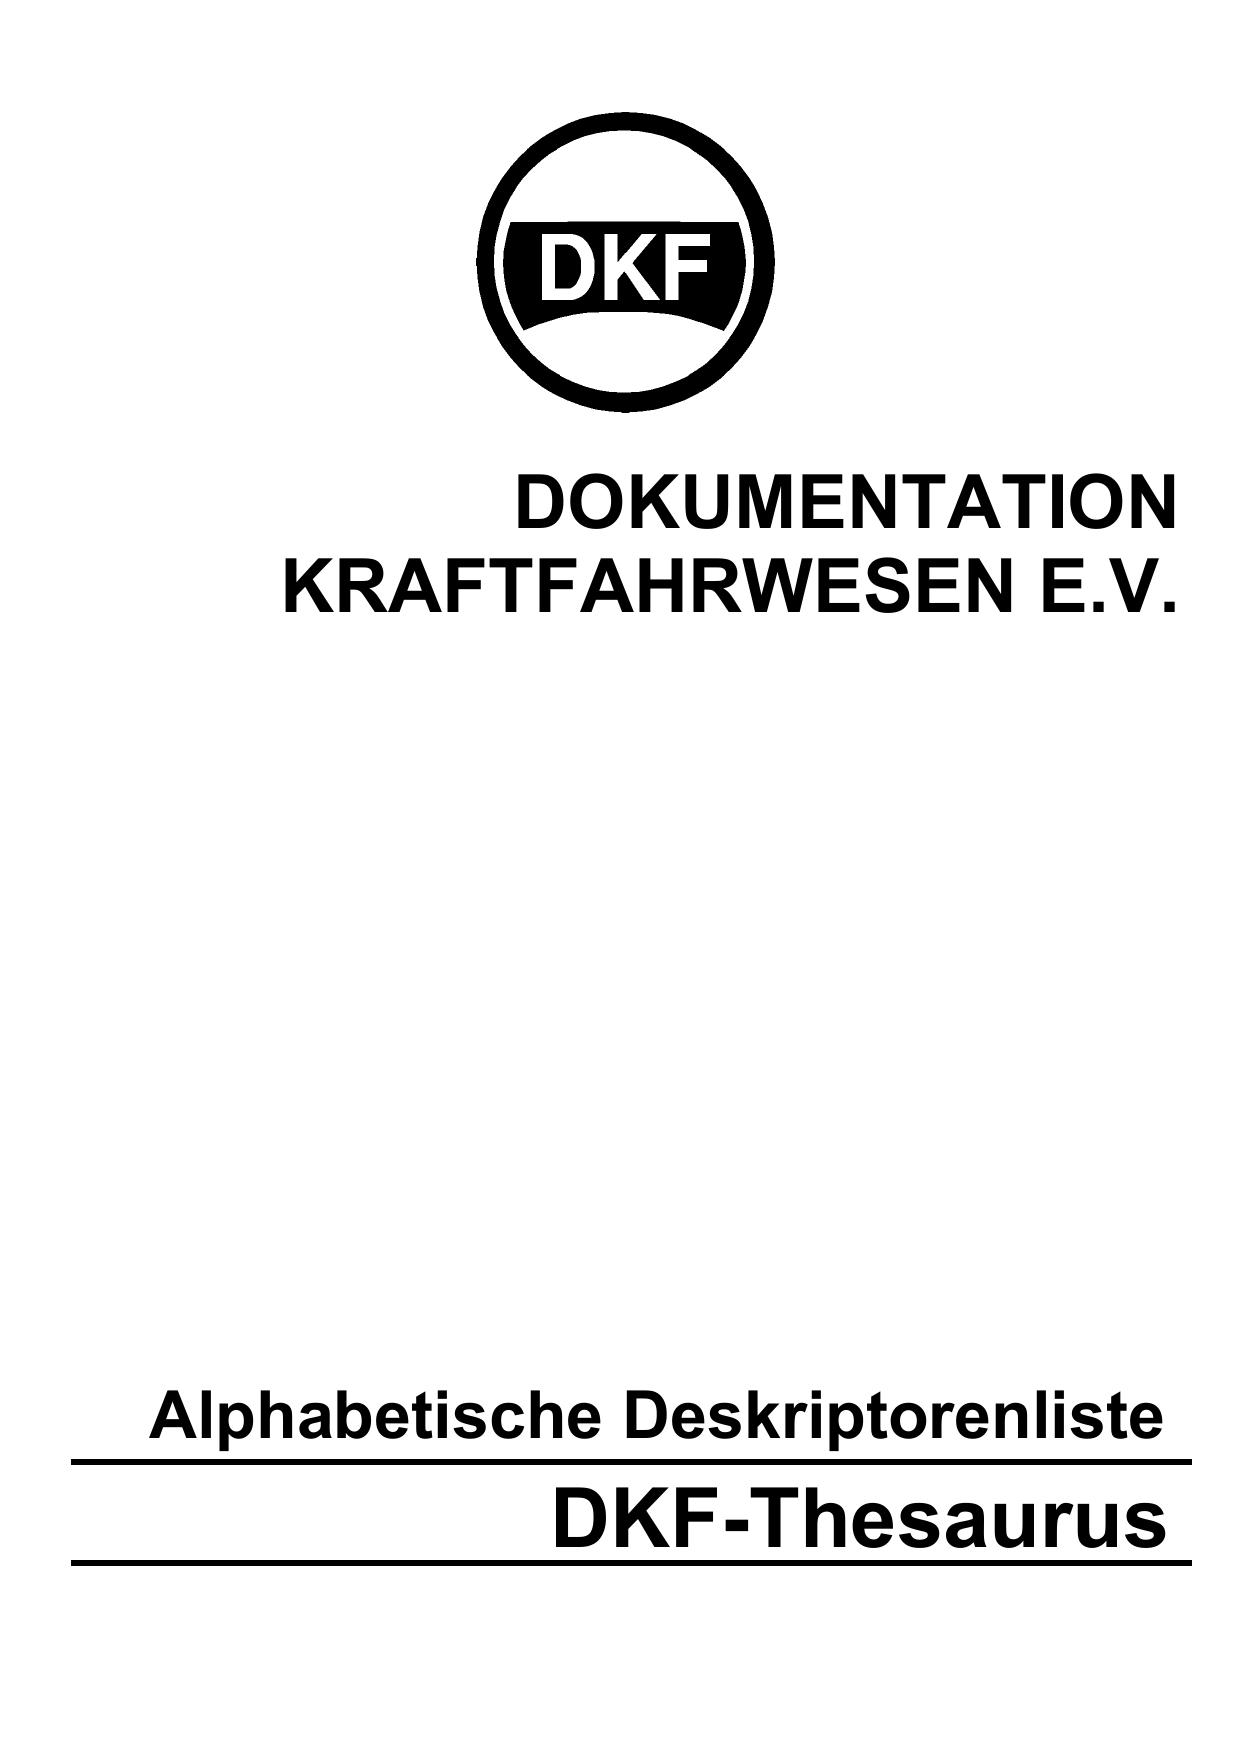 DKF-Thesaurus - Dokumentation Kraftfahrwesen | manualzz.com